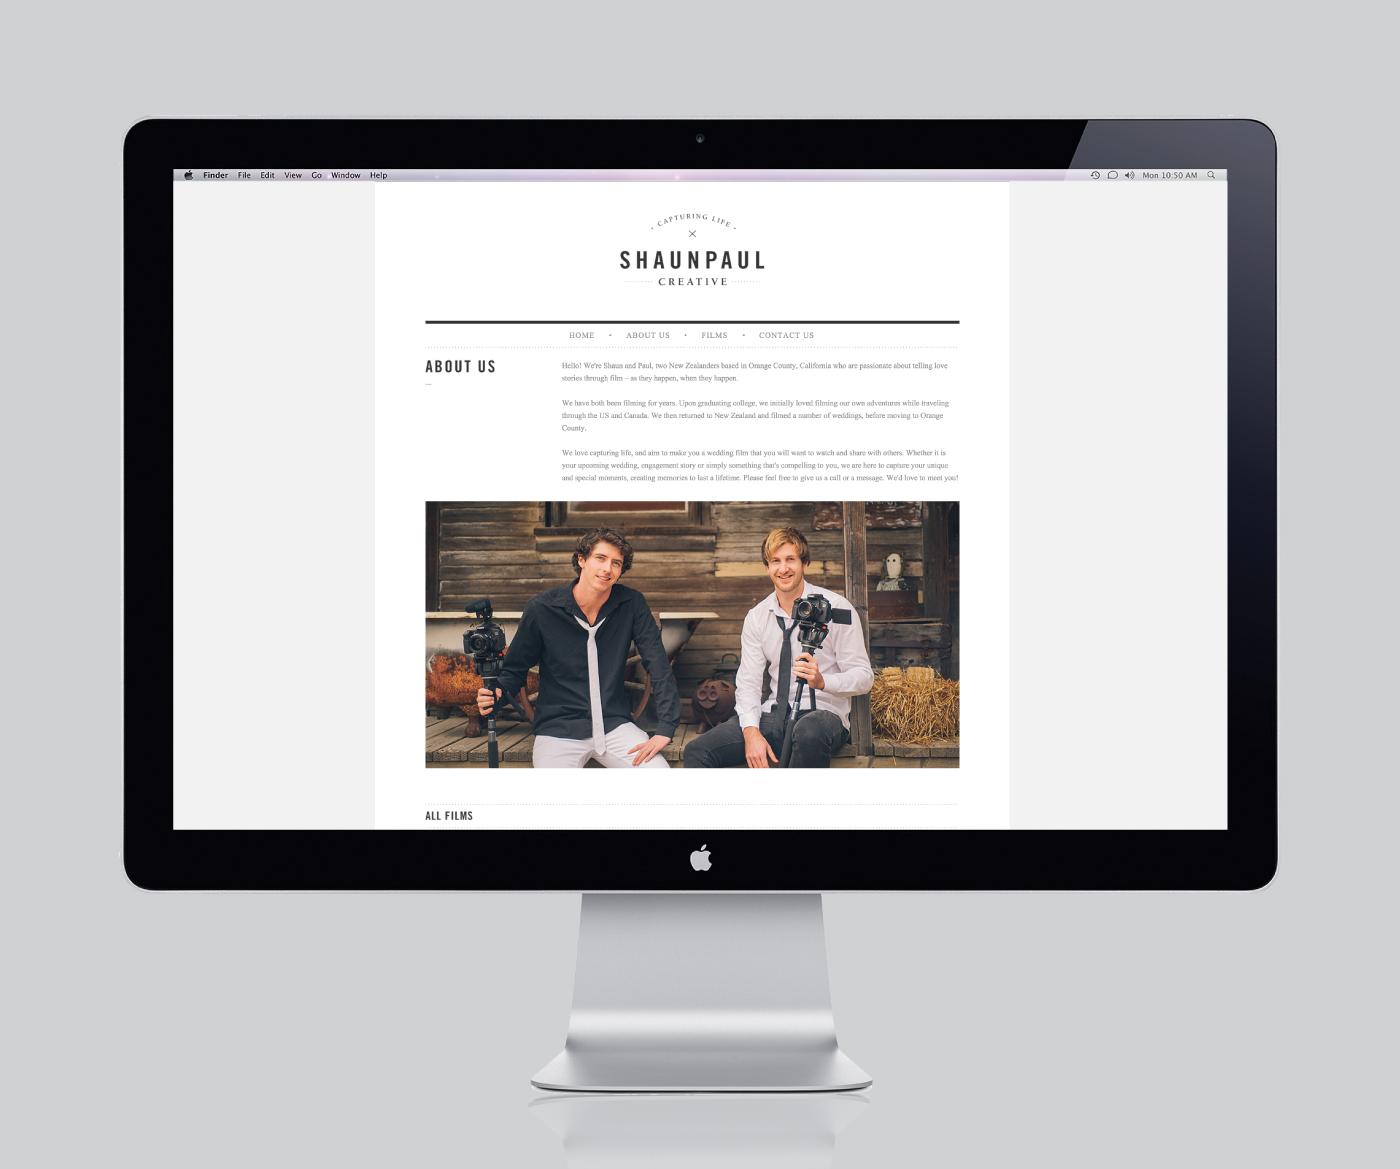 shaunpaul-website-aboutpage.jpg